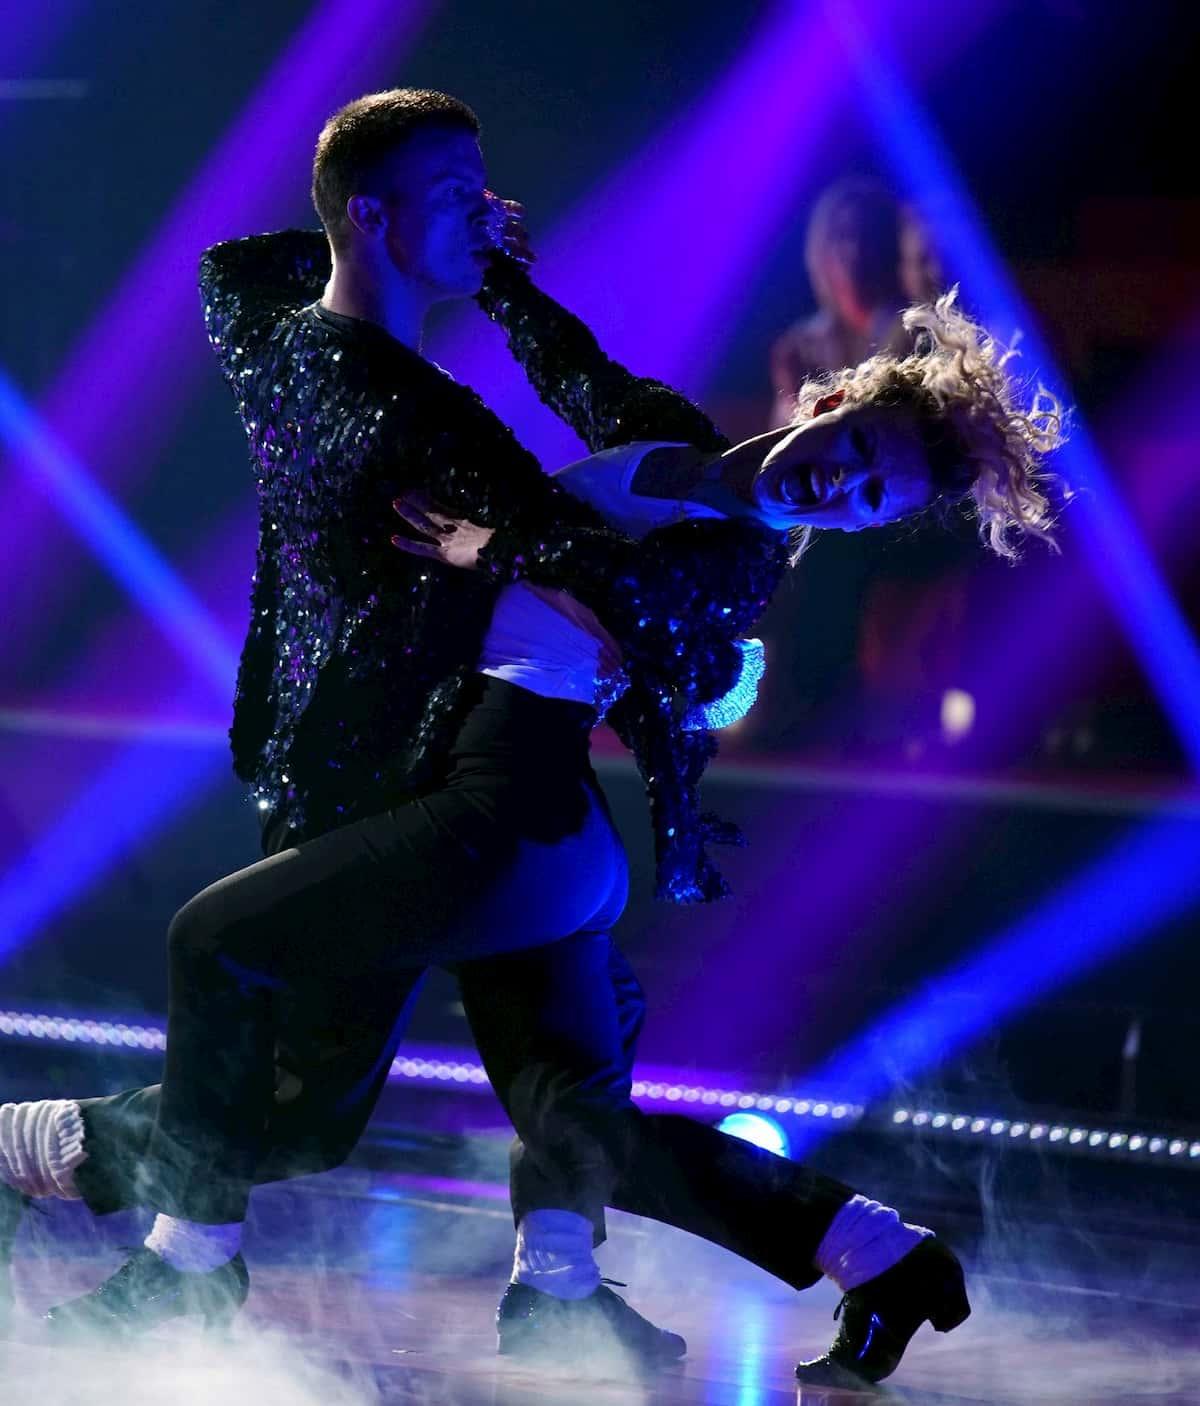 Anton Skuratov - Alona Uehlin bei der Let's dance Profi-Challenge am 29.5.2020